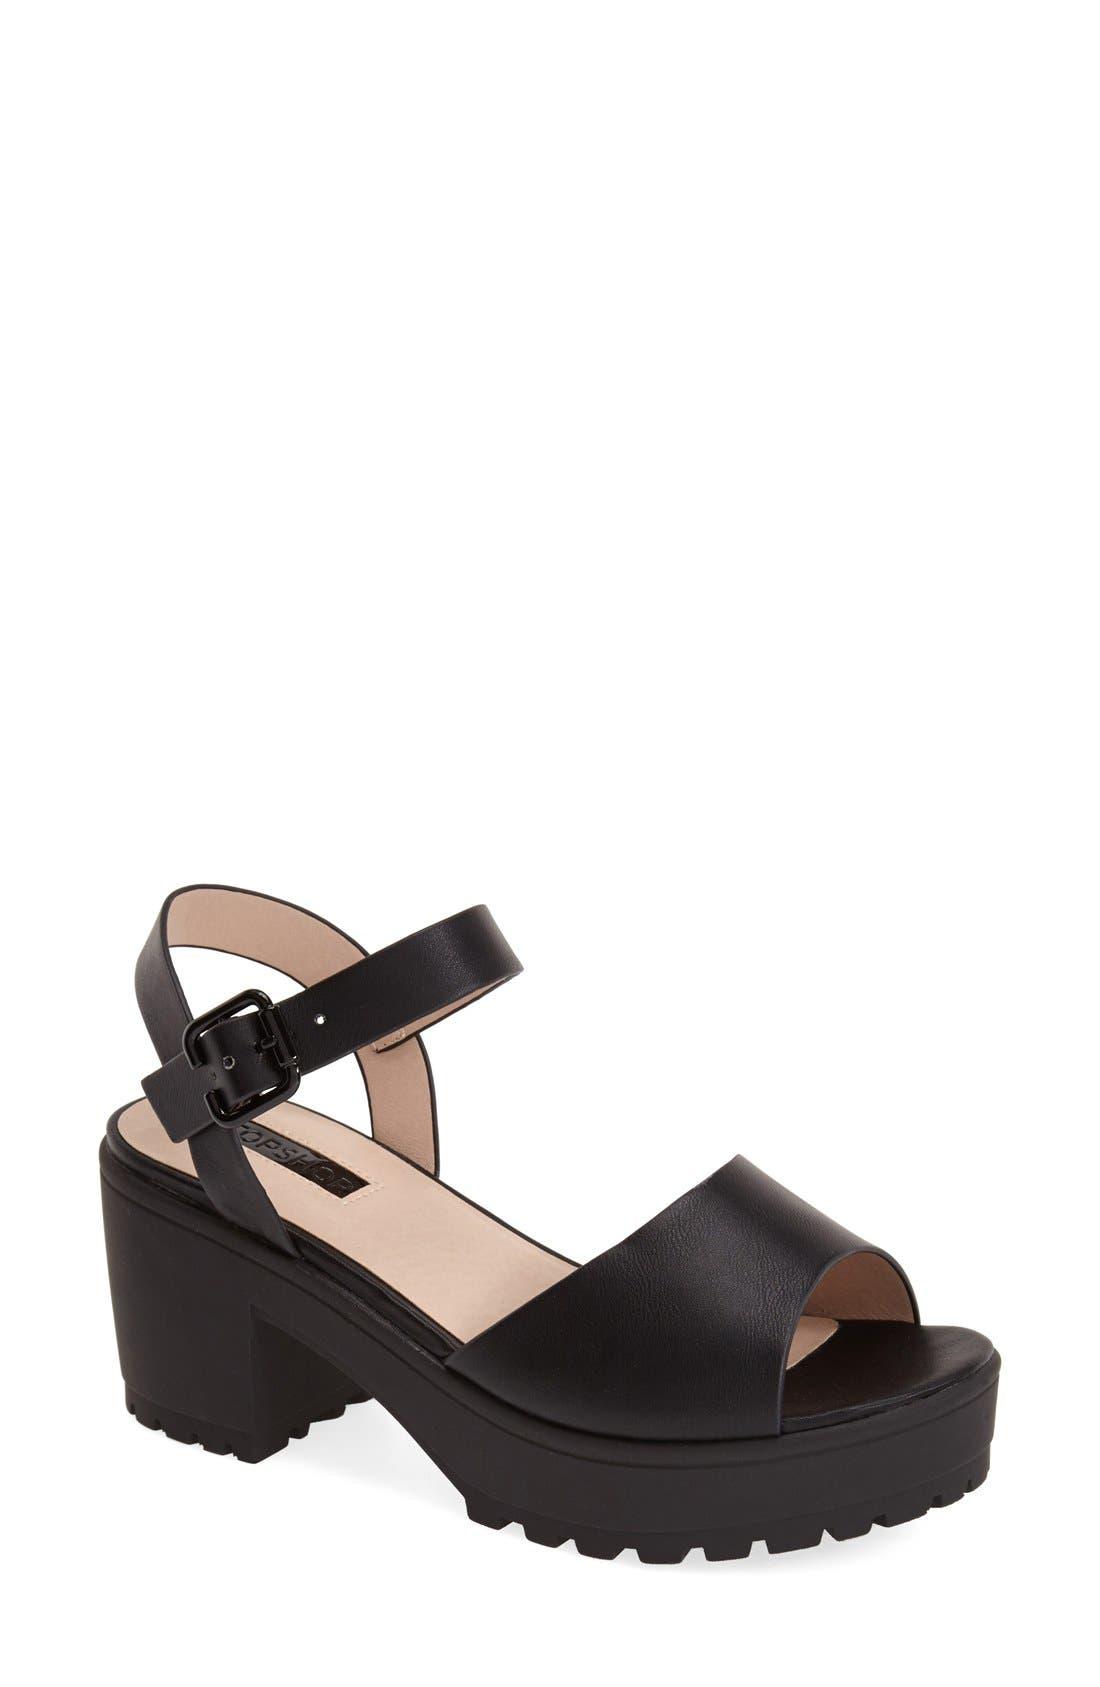 Alternate Image 1 Selected - Topshop 'Hatty' Ankle Strap Sandal (Women)